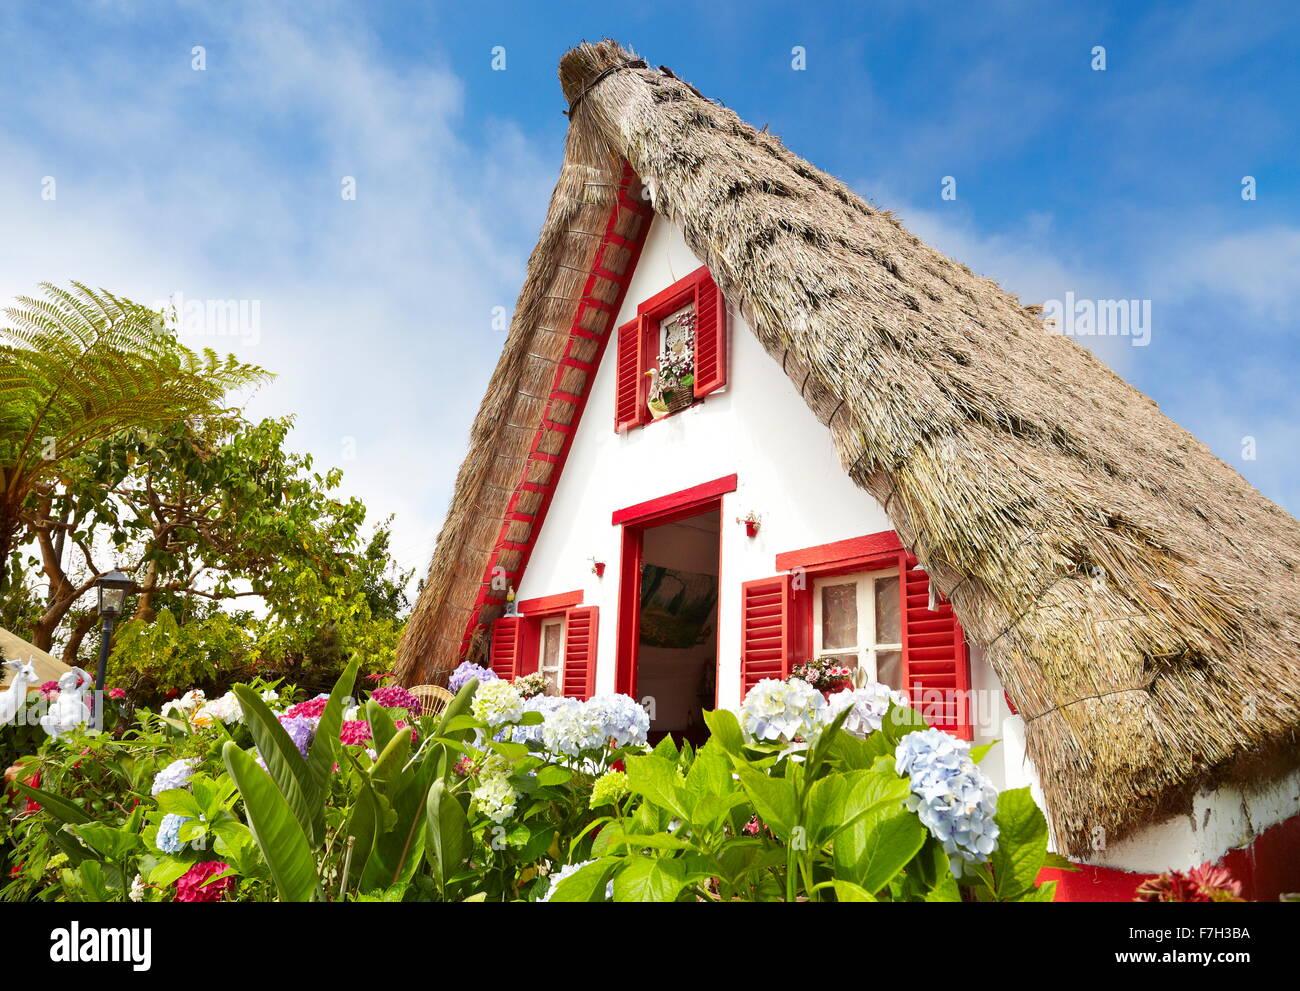 Traditional home palheiros - Santana village, Madeira Island, Portugal - Stock Image